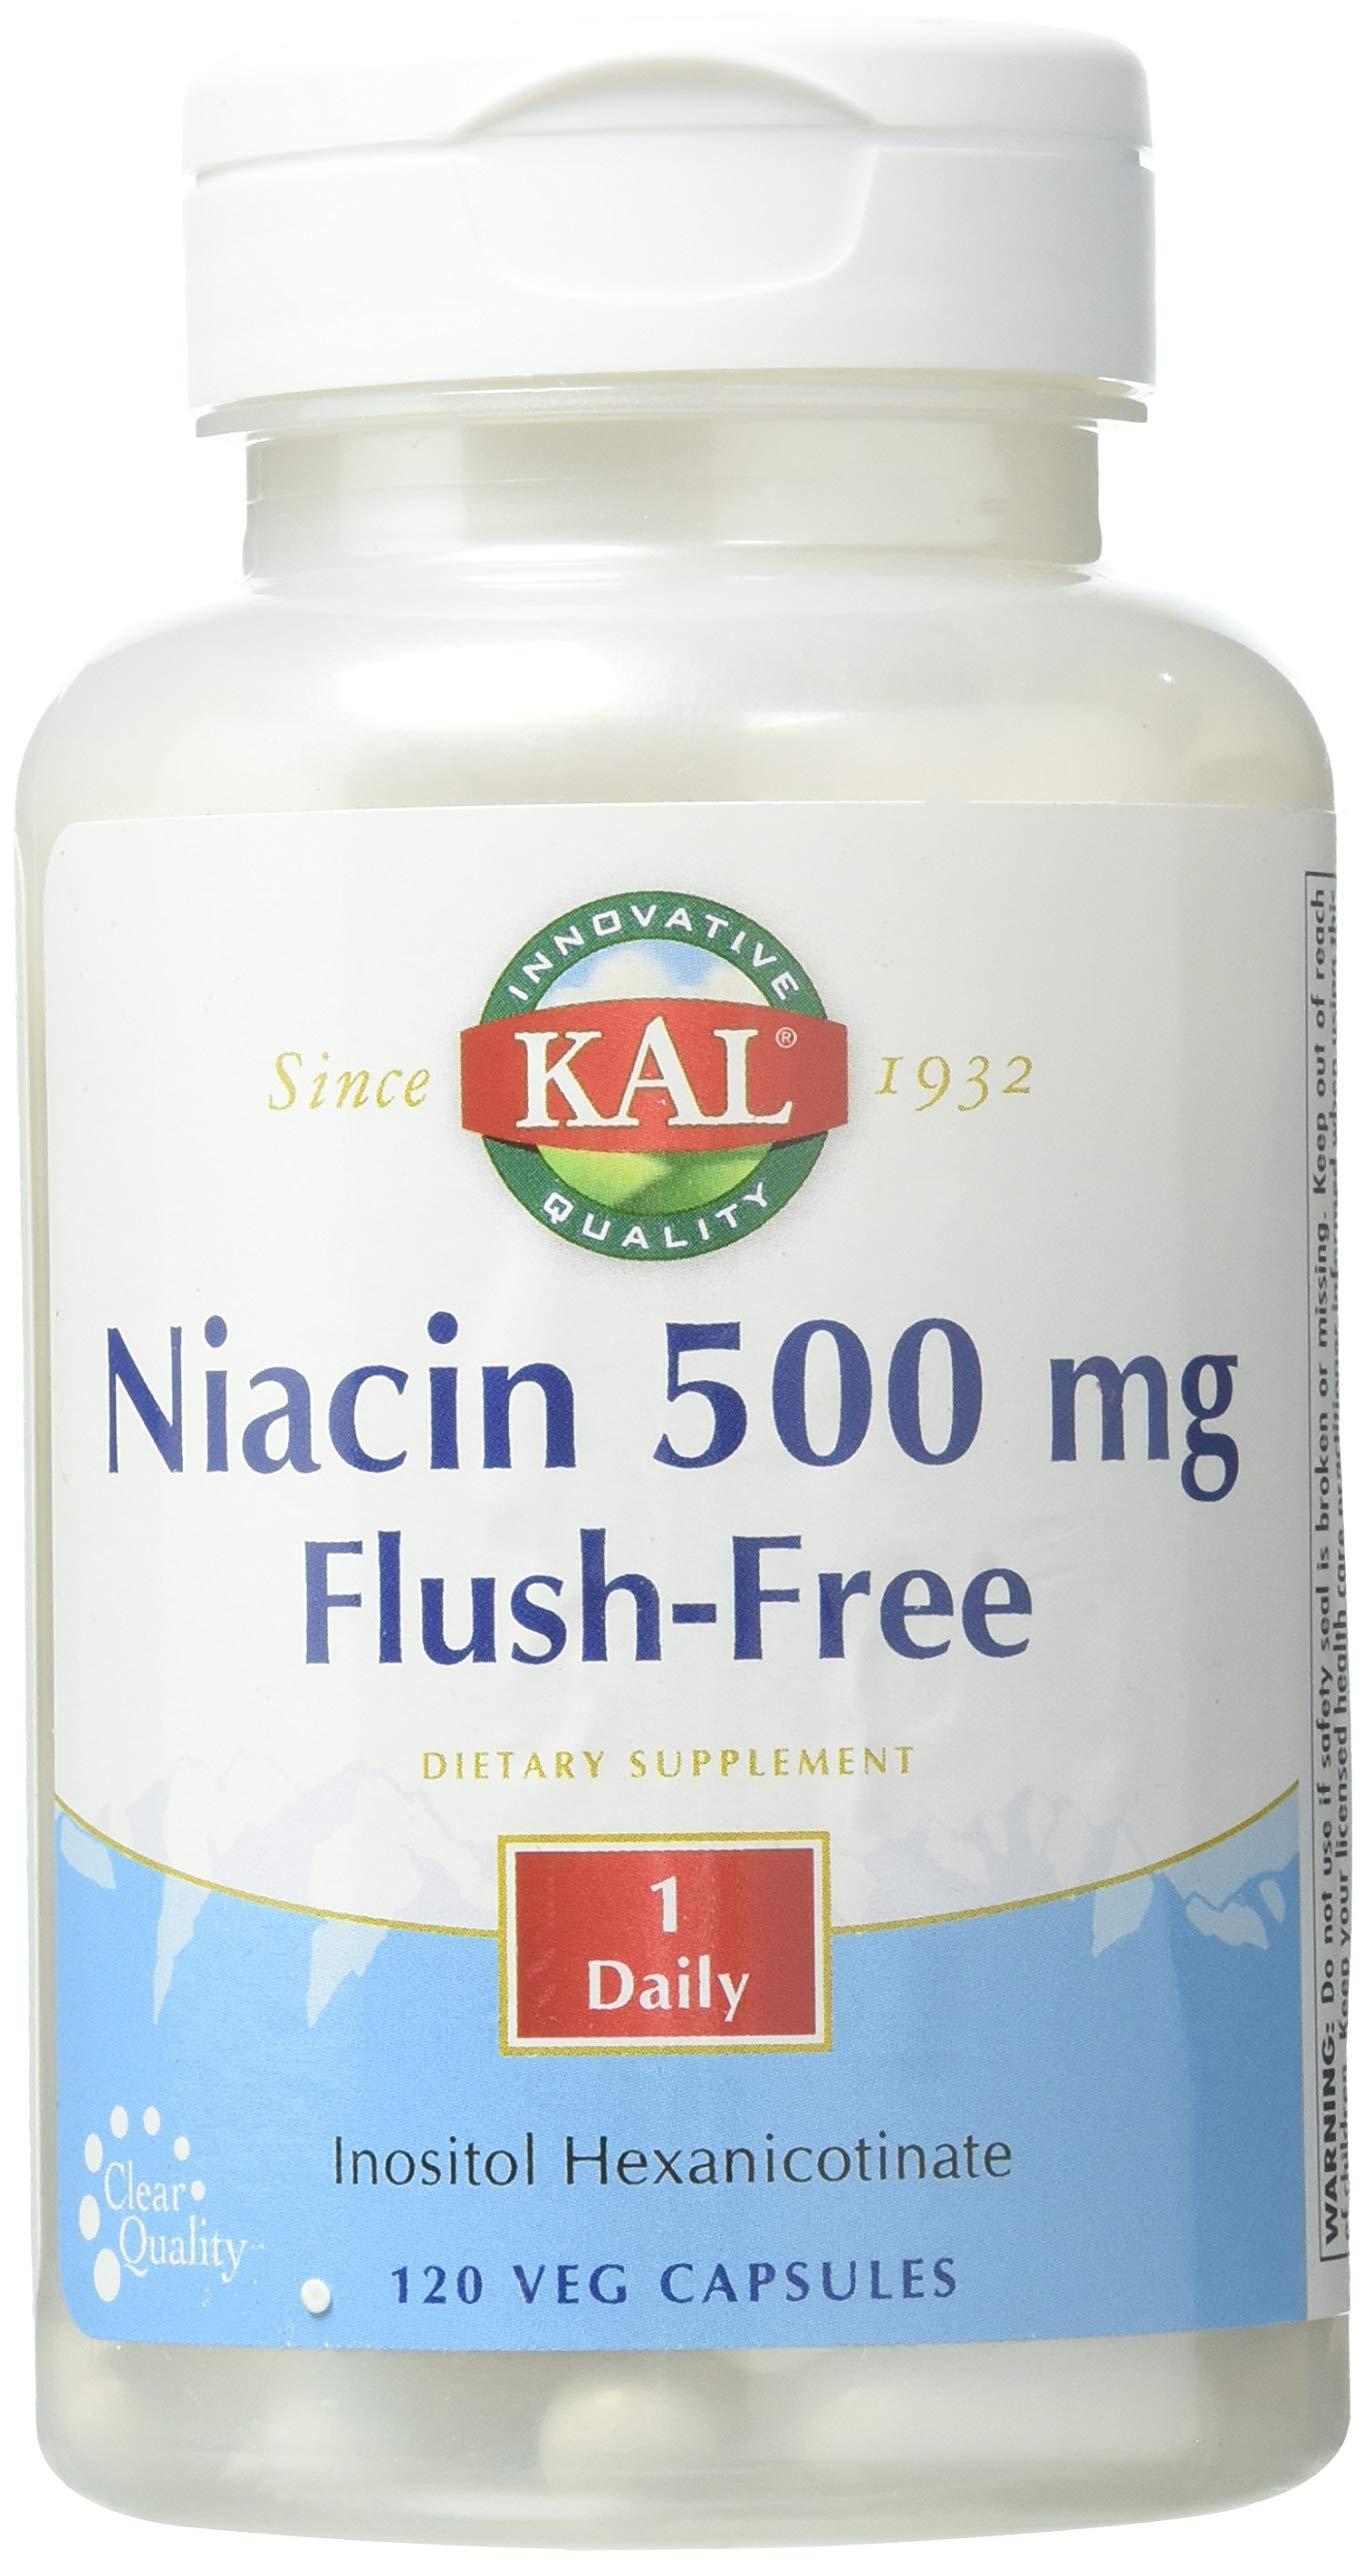 KAL Niacin Flush-Free Capsules 500 Mg, 120 Count